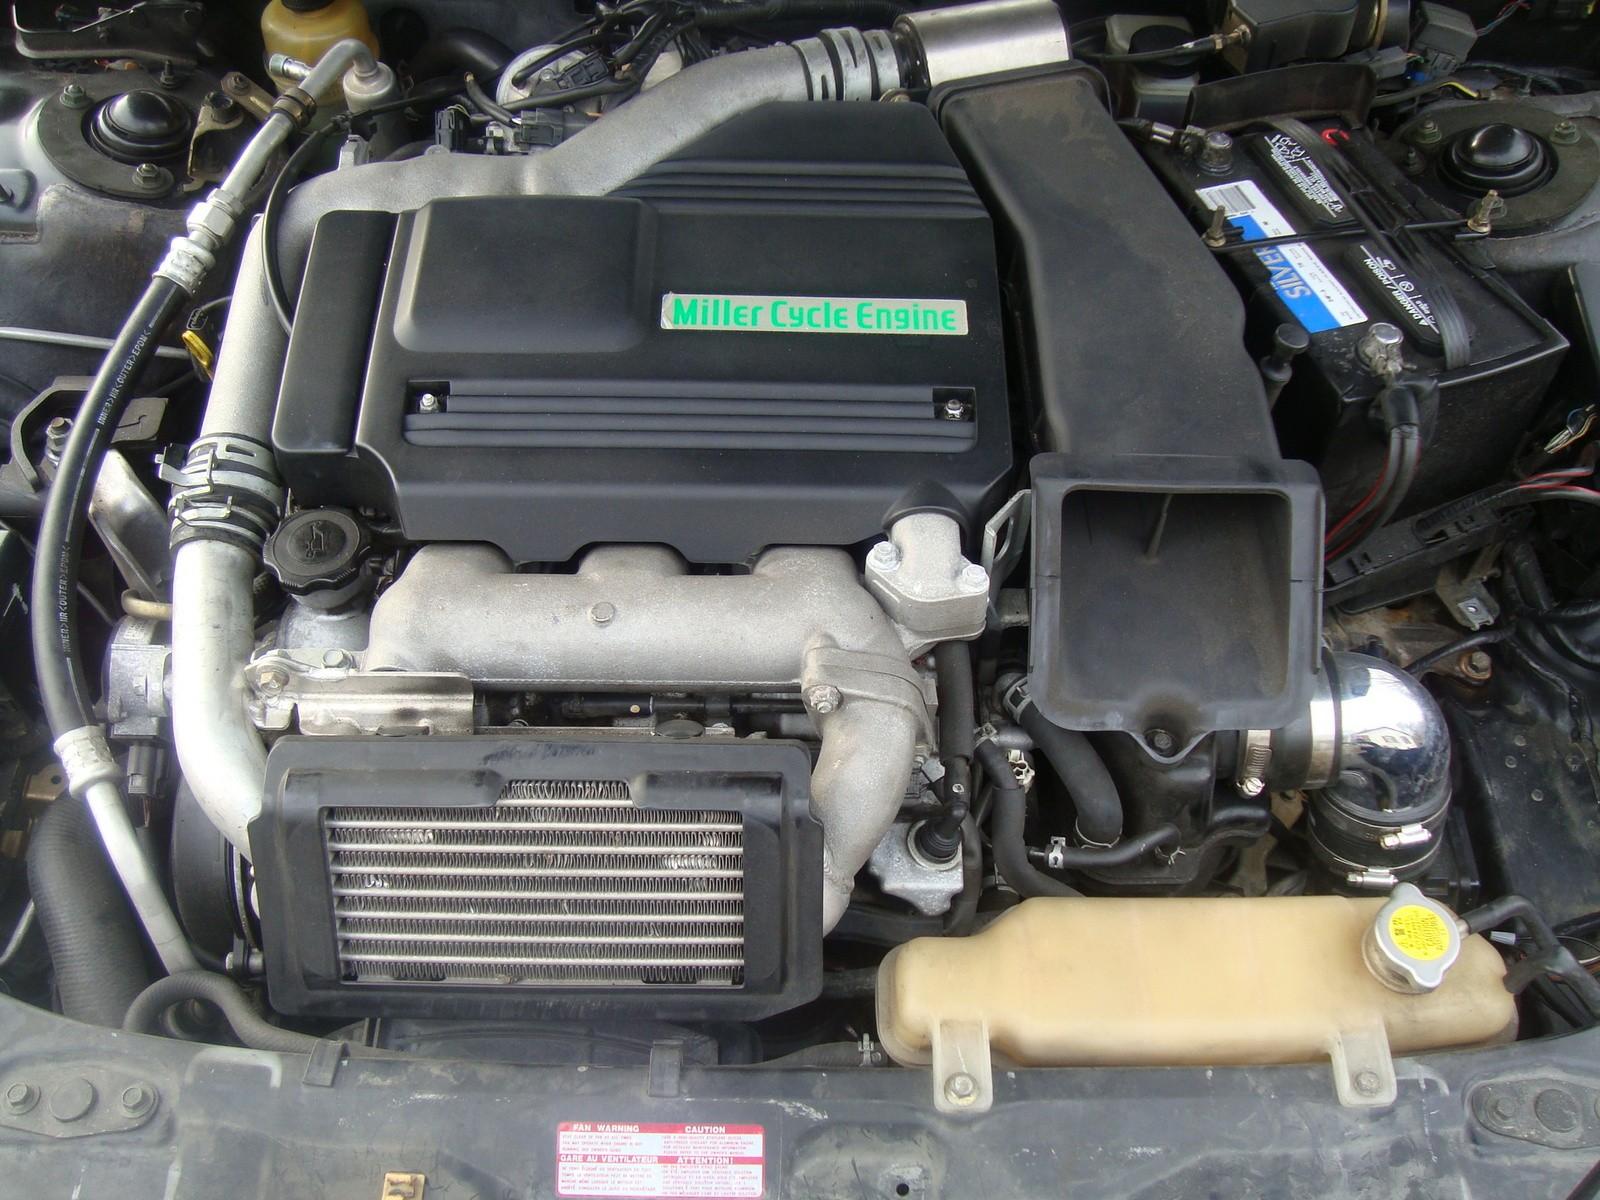 2001 Mazda Millenia Engine Diagram Mazda Millenia Engine Gallery Moibibiki 1 Of 2001 Mazda Millenia Engine Diagram